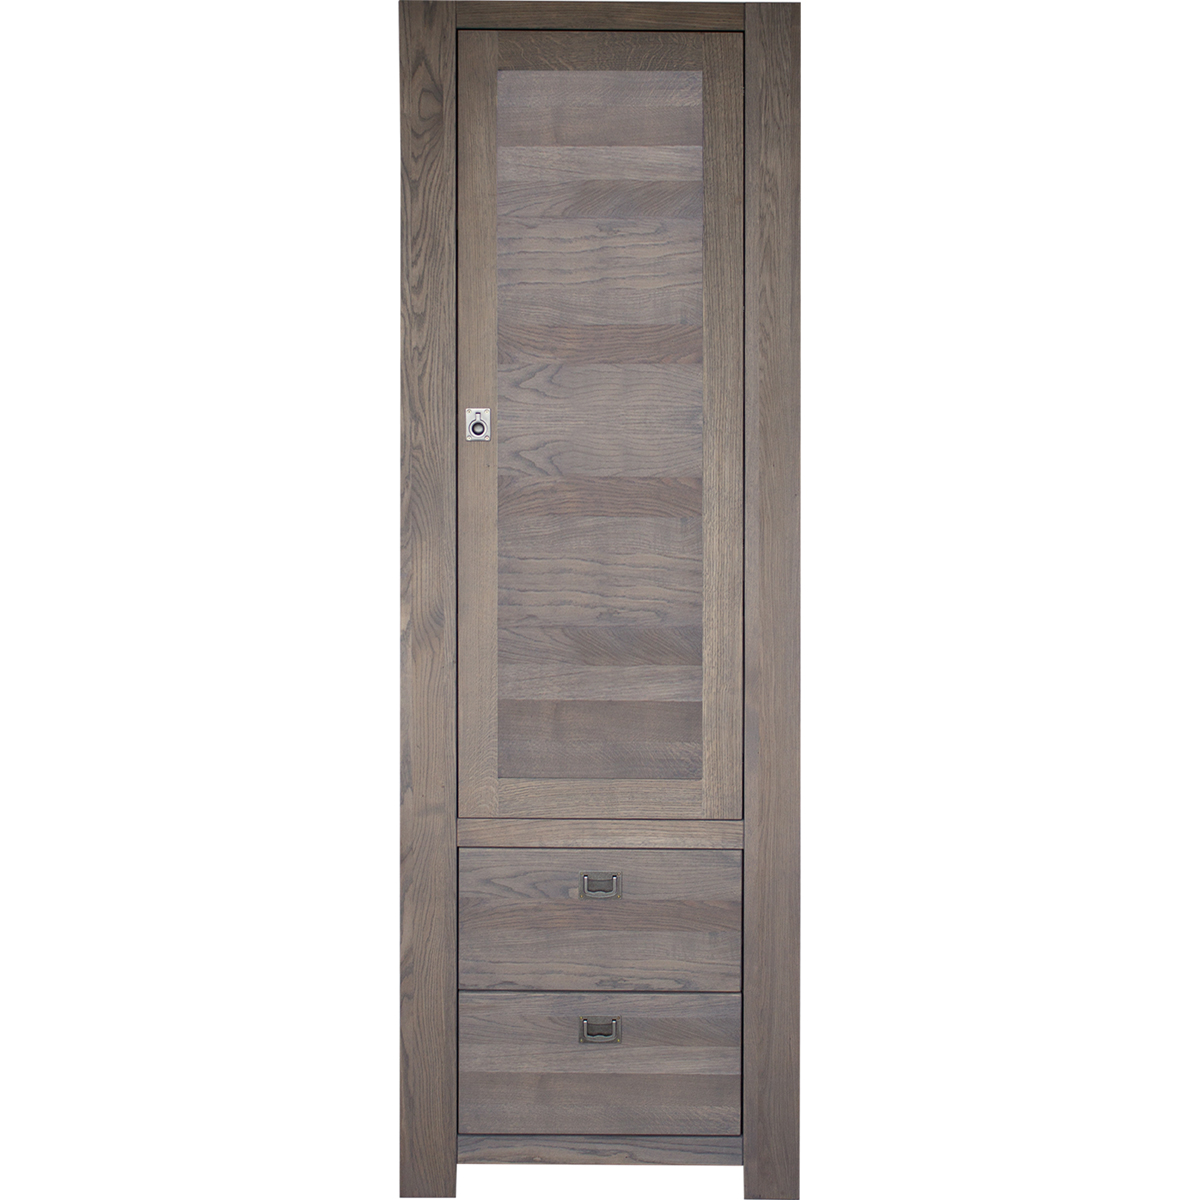 die vitrine tirol im edlen design exklusiv nur in unserem online shop moebel trend 24. Black Bedroom Furniture Sets. Home Design Ideas